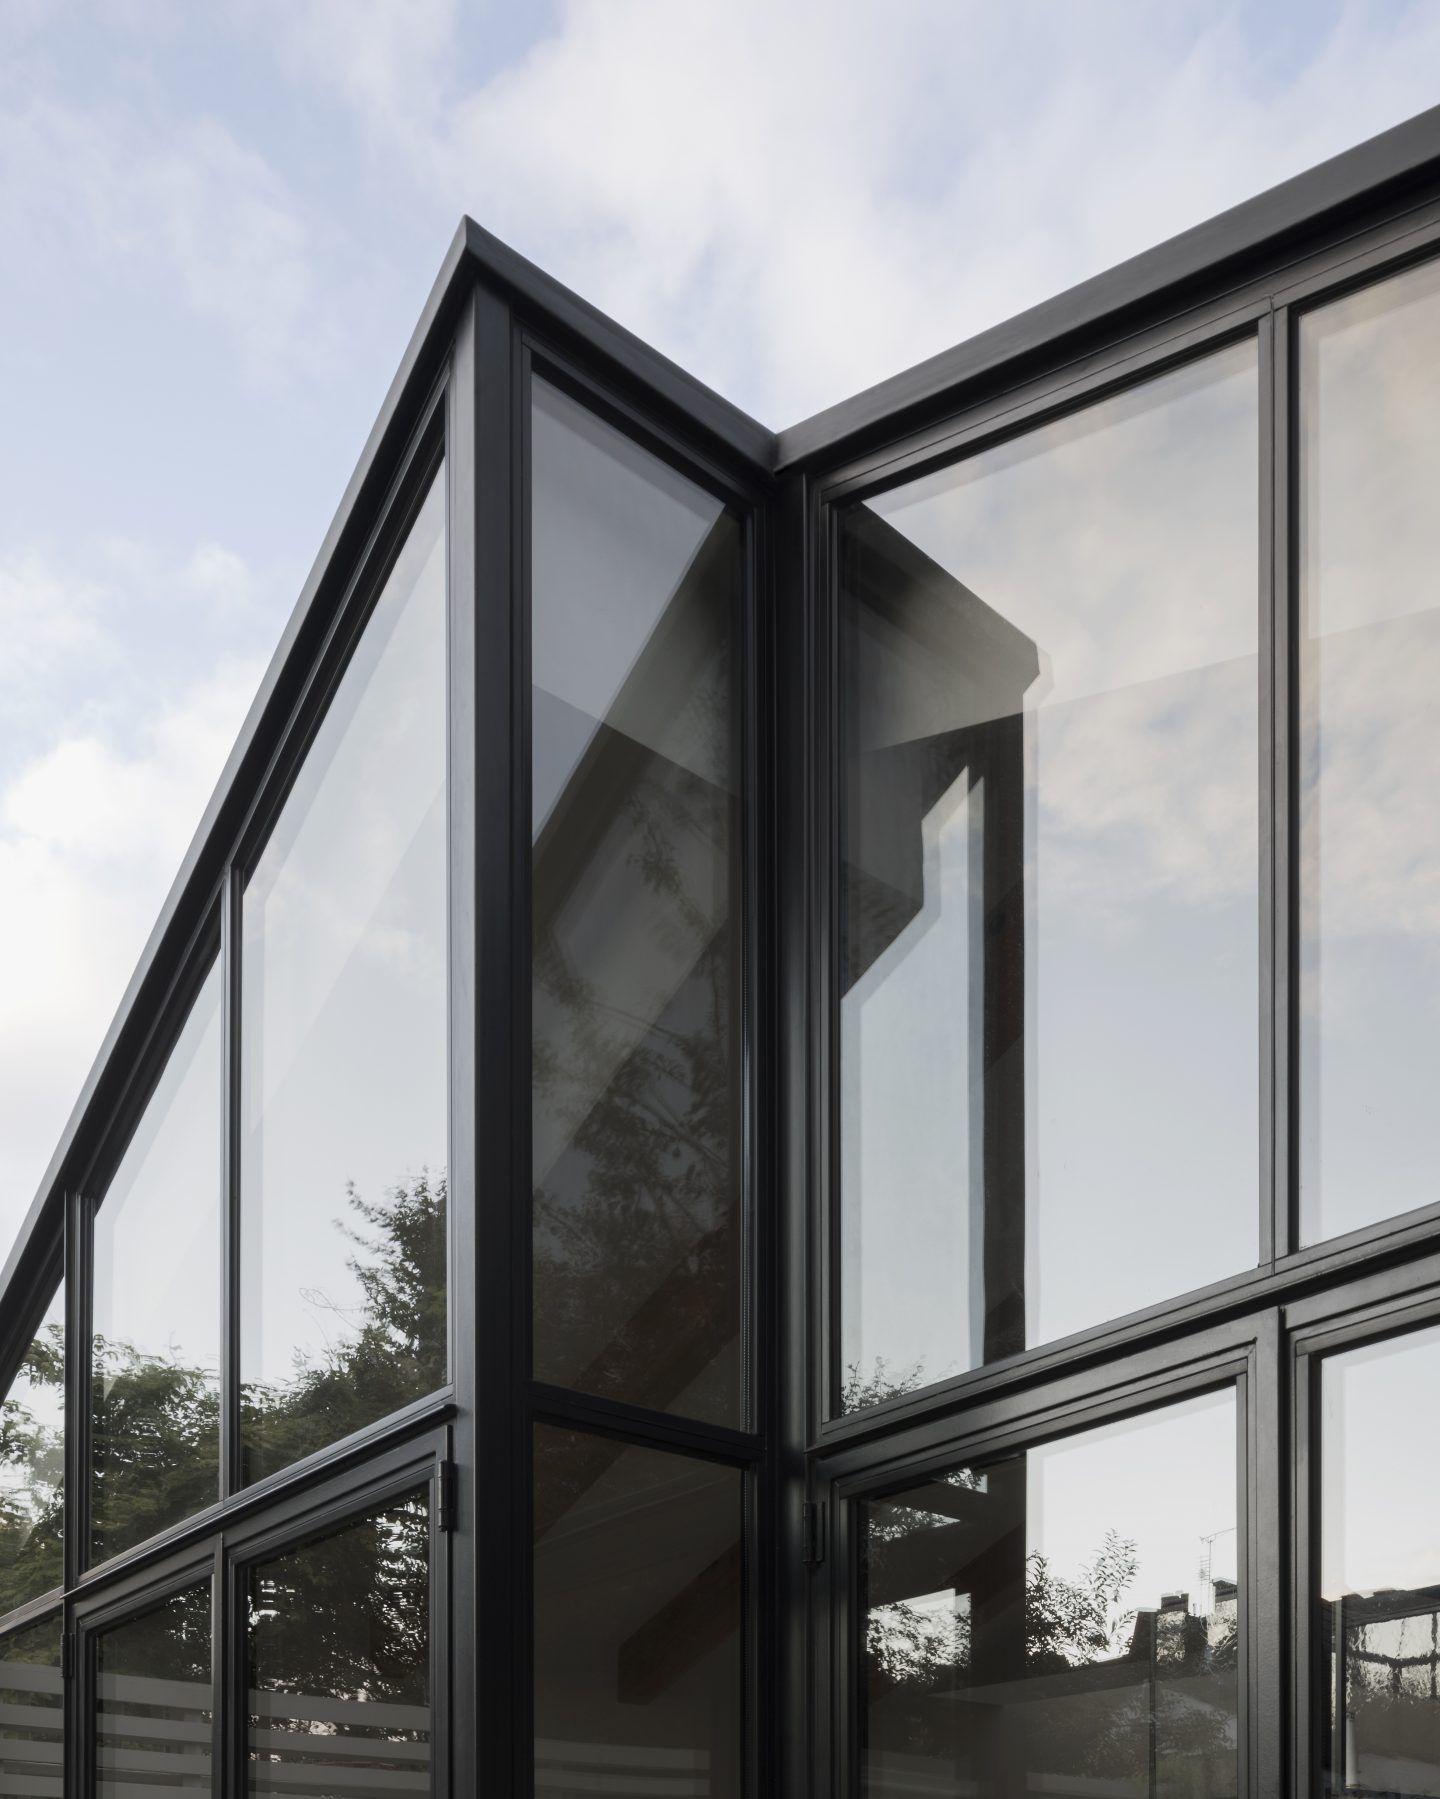 IGNANT-Architecture-WillGambleArchitects-BurntHouse-11